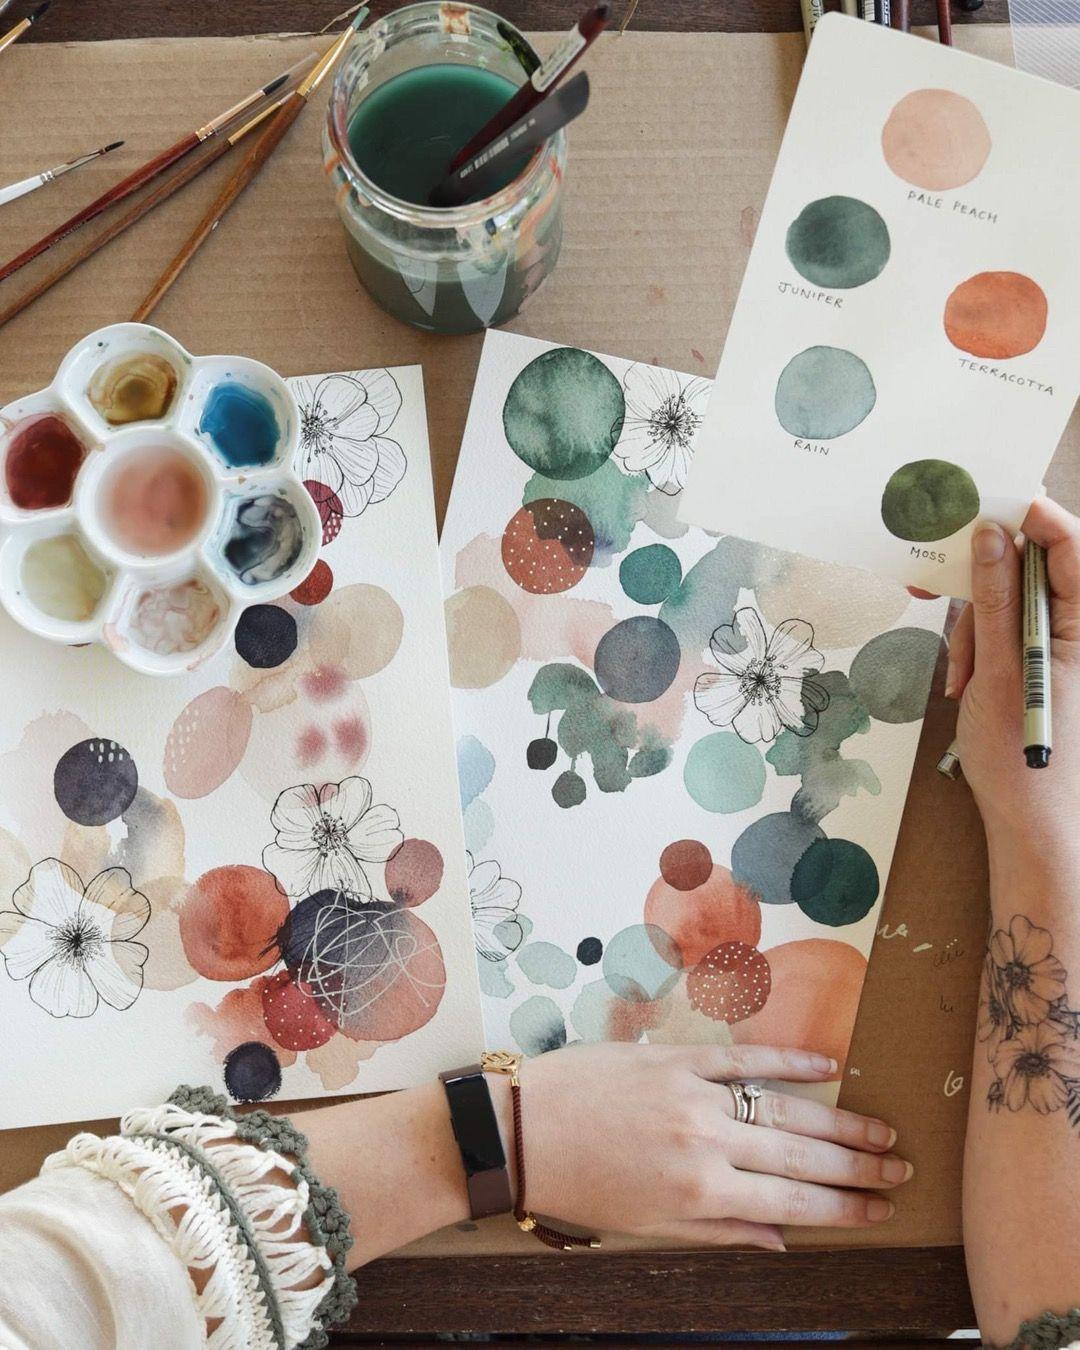 Wild Rose Abstract -   - #abstract #Artists #Ceramics #FashionTrends #Pottery #rose #RunwayFashion #Wild #Women'sStreetStyle #abstraktezeichnungen